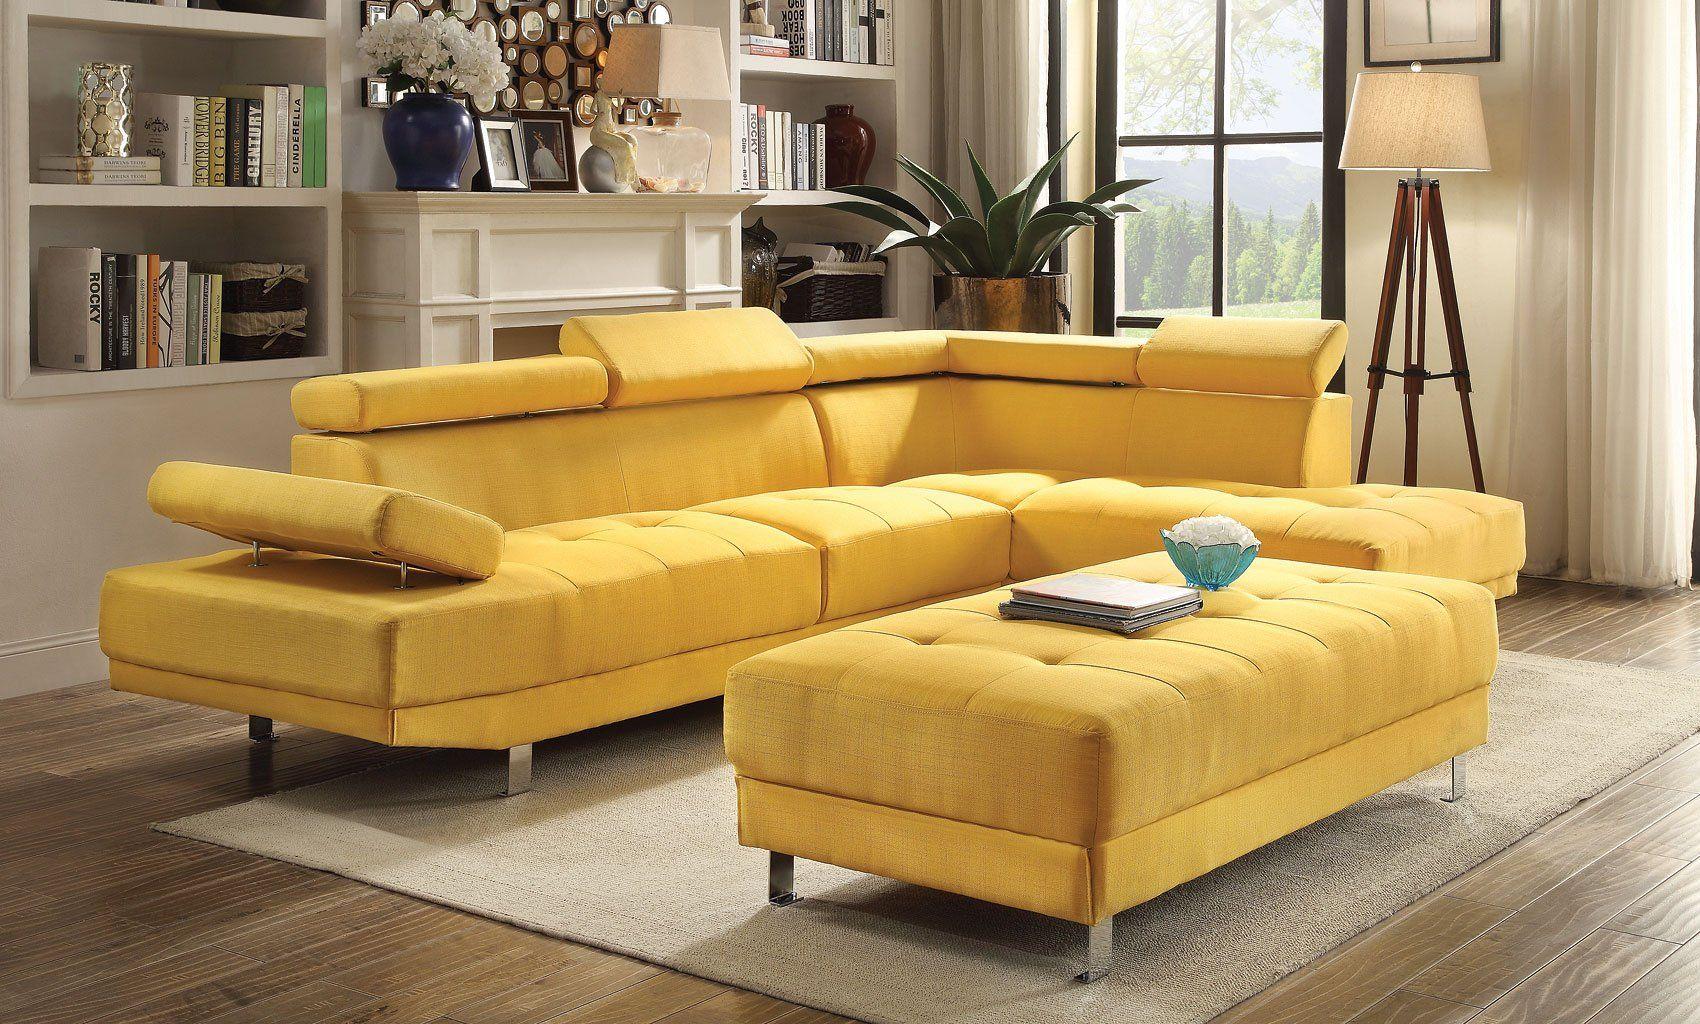 Milan Sectional Set Yellow Home Living Room Furniture Retro Home Decor